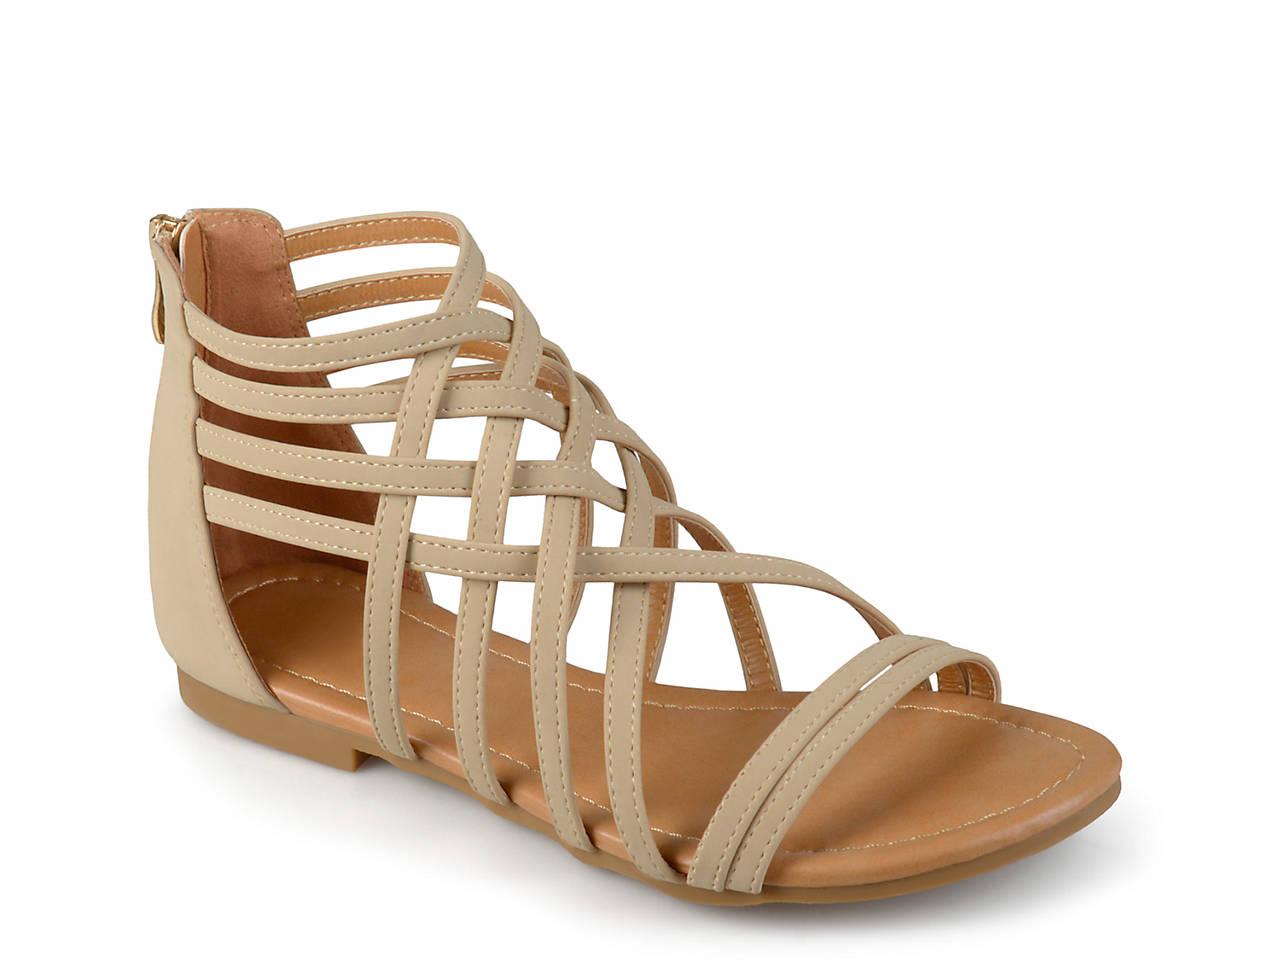 8e75225f2530 Gladiator Sandals